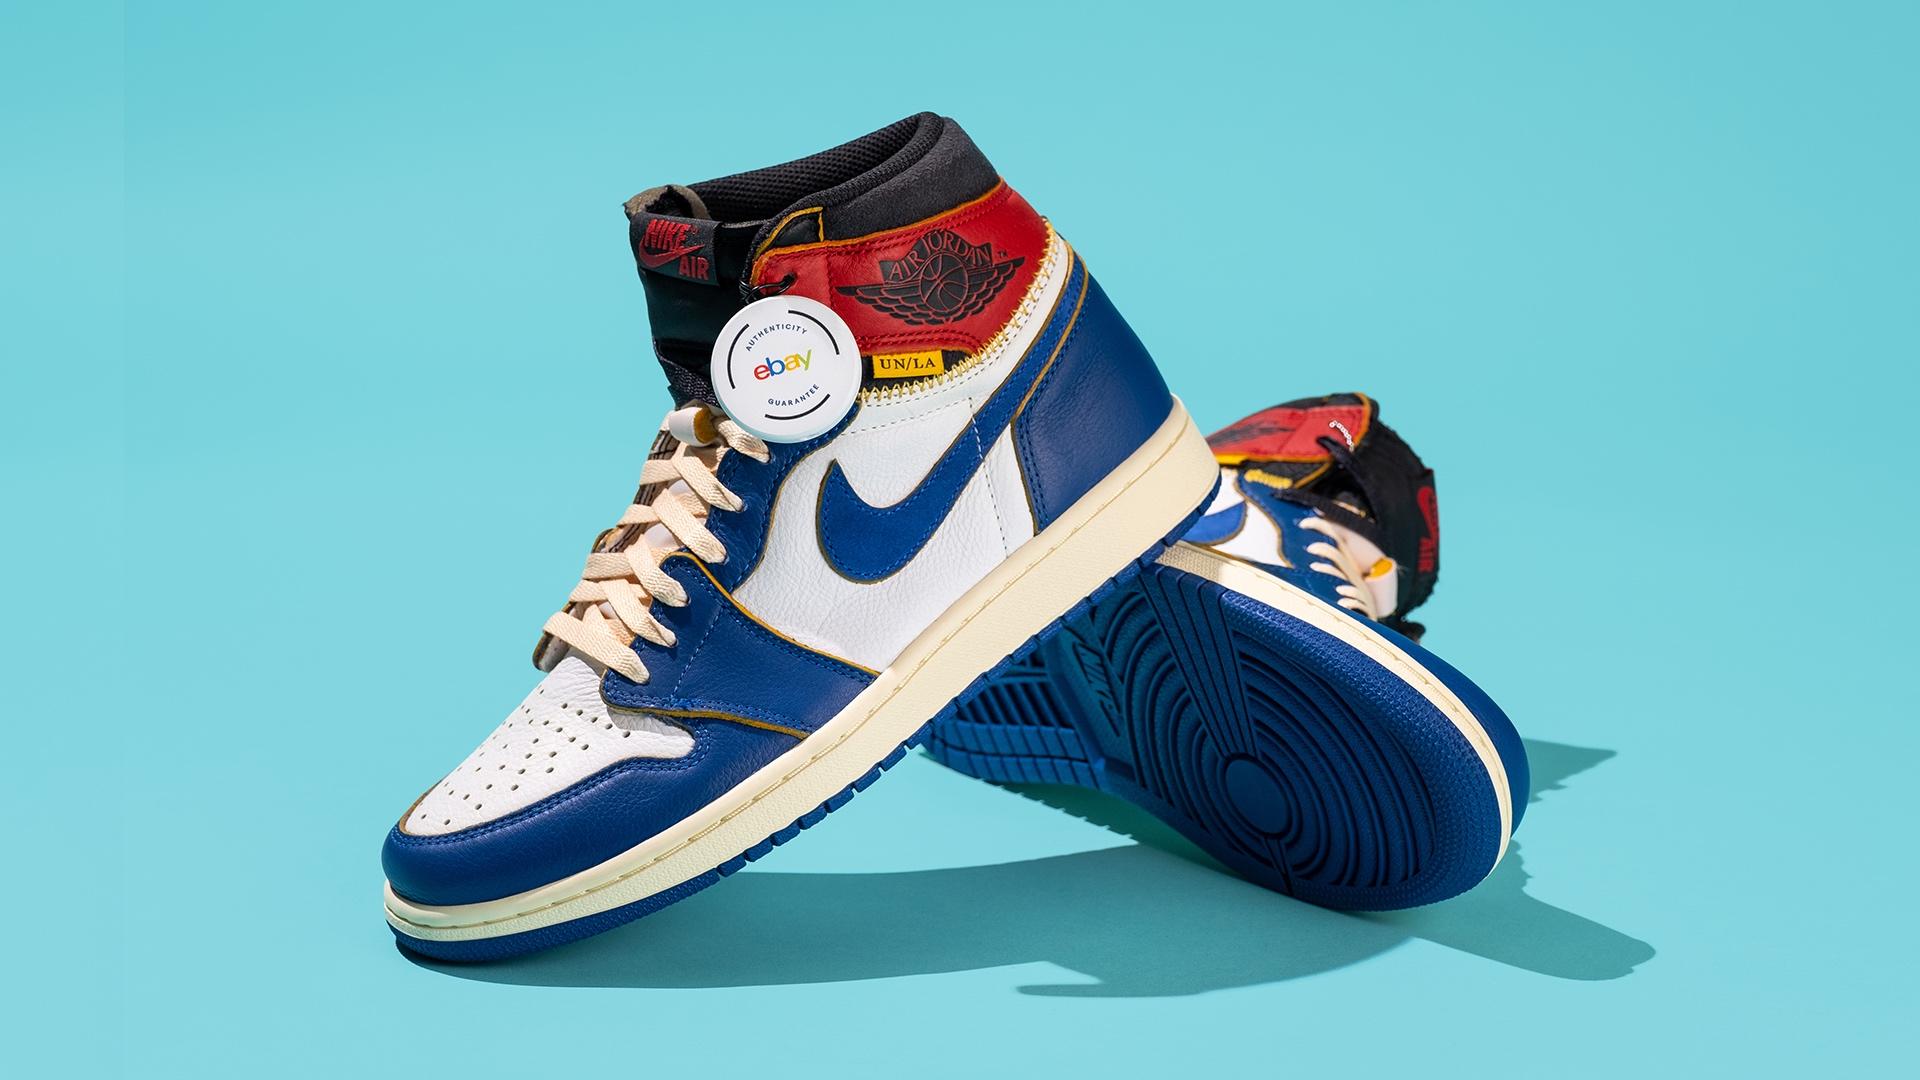 Nikes on eBay